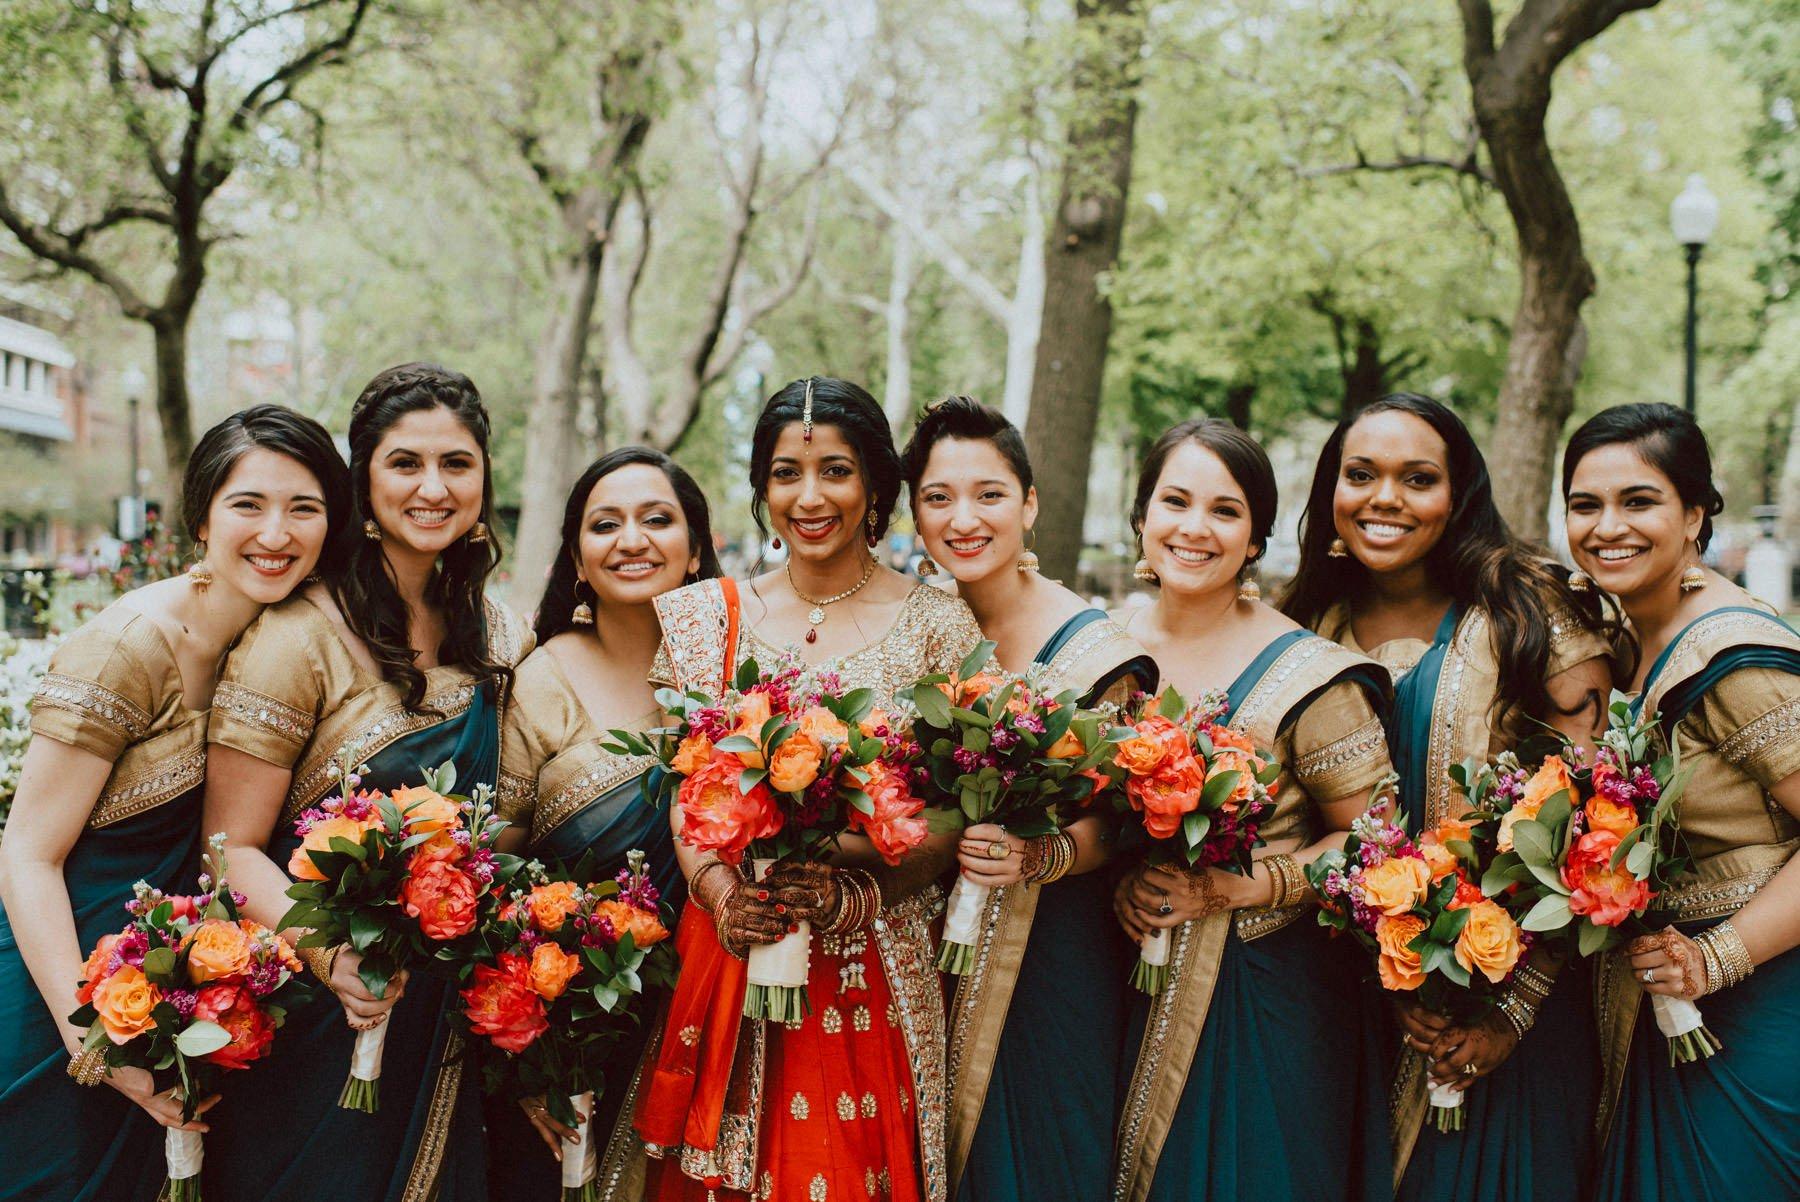 vie-philadelphia-indian-wedding-37.jpg